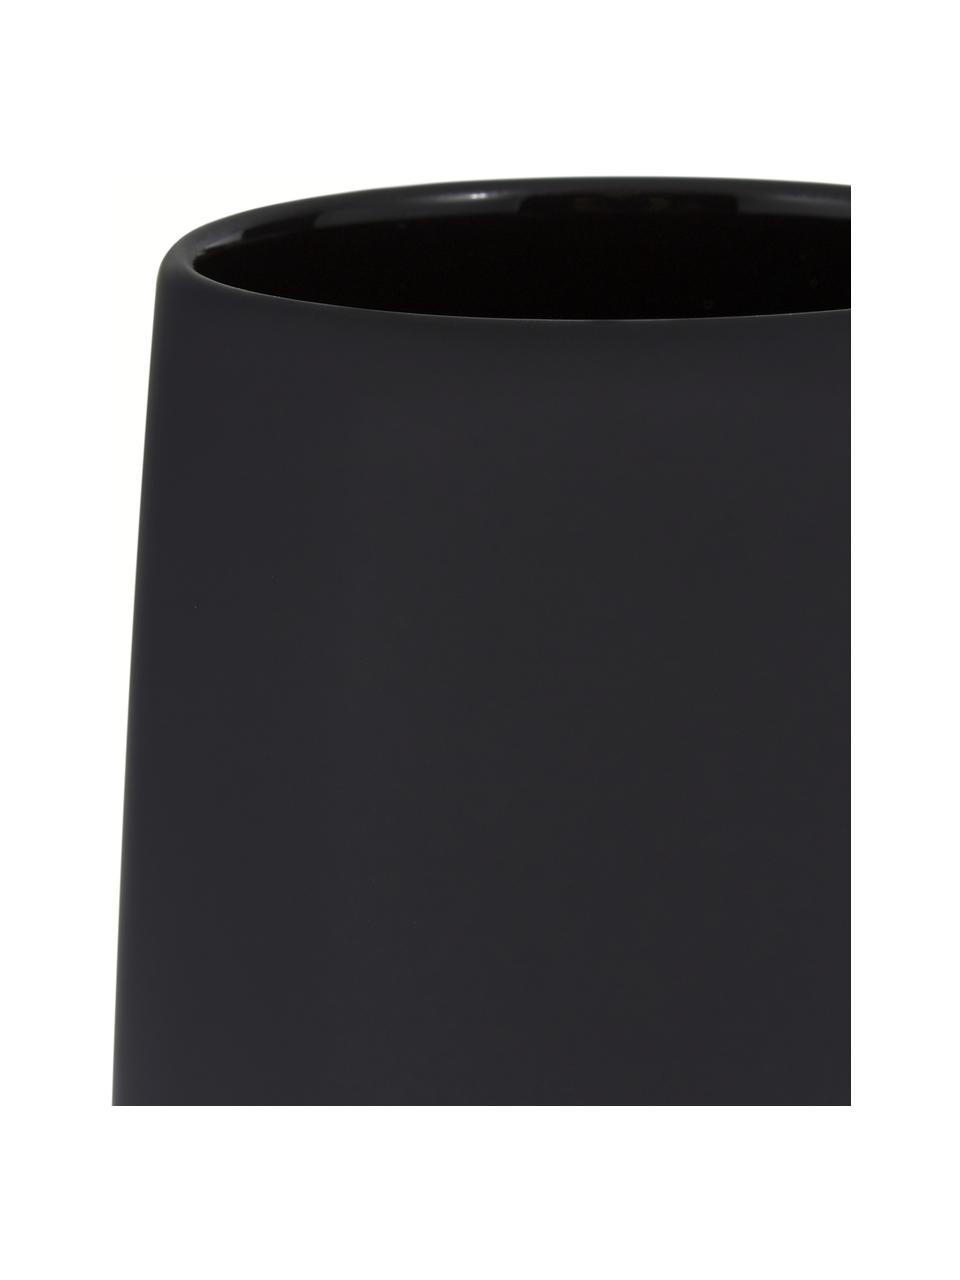 Porzellan-Zahnputzbecher Nova One, Porzellan, Schwarz, Ø 8 x H 10 cm